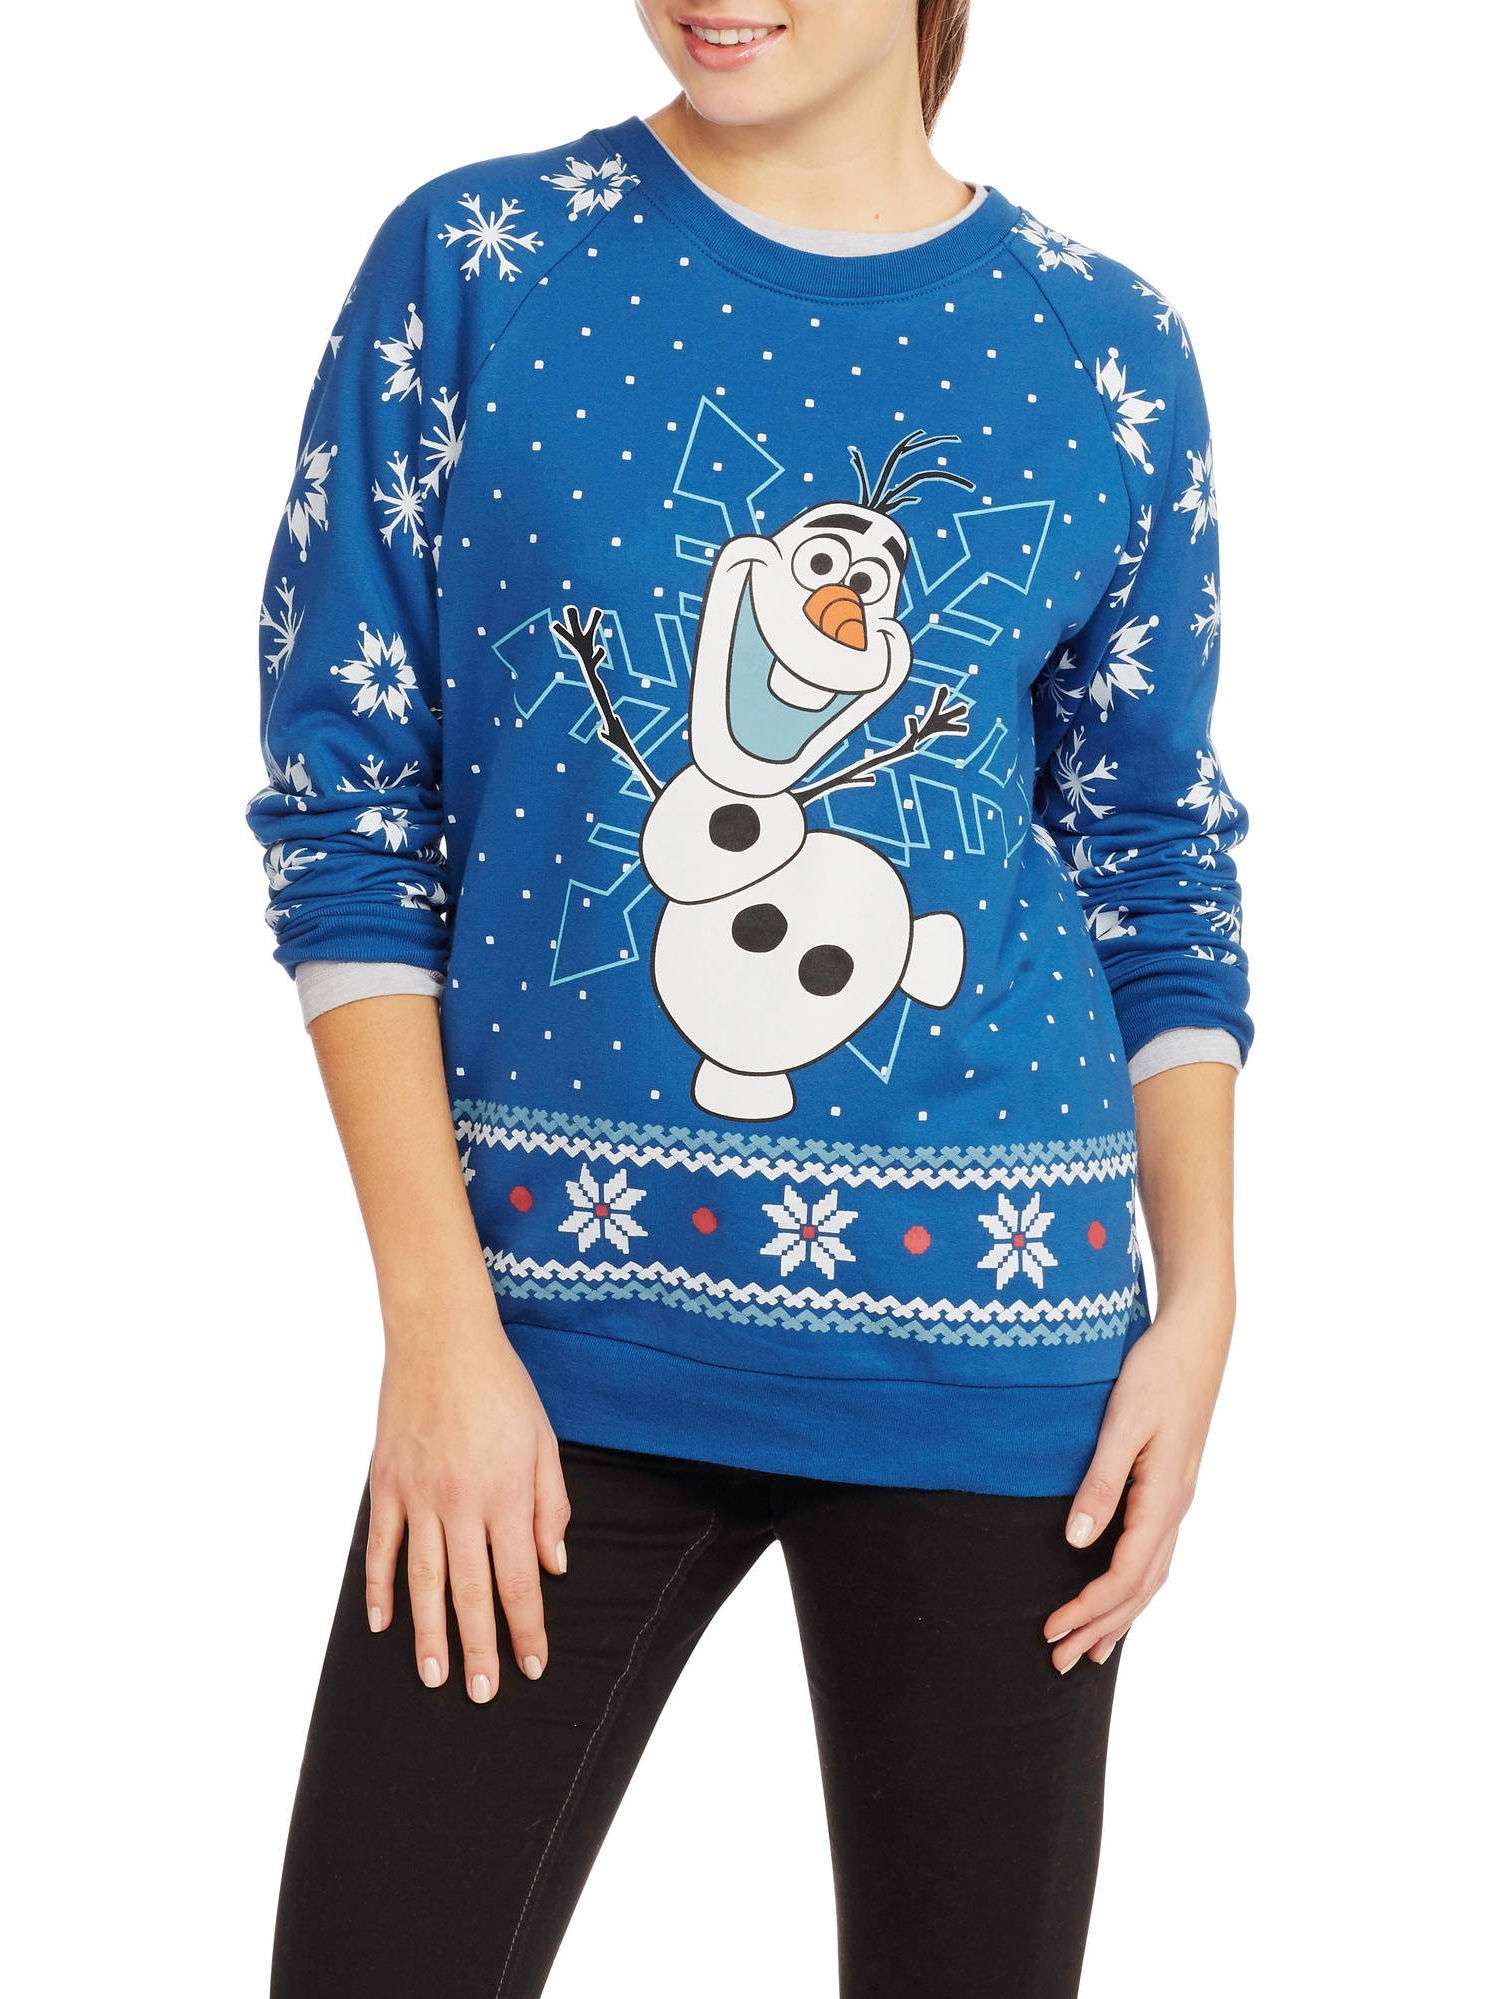 Olaf Juniors Ugly Christmas Pullover - Walmart.com